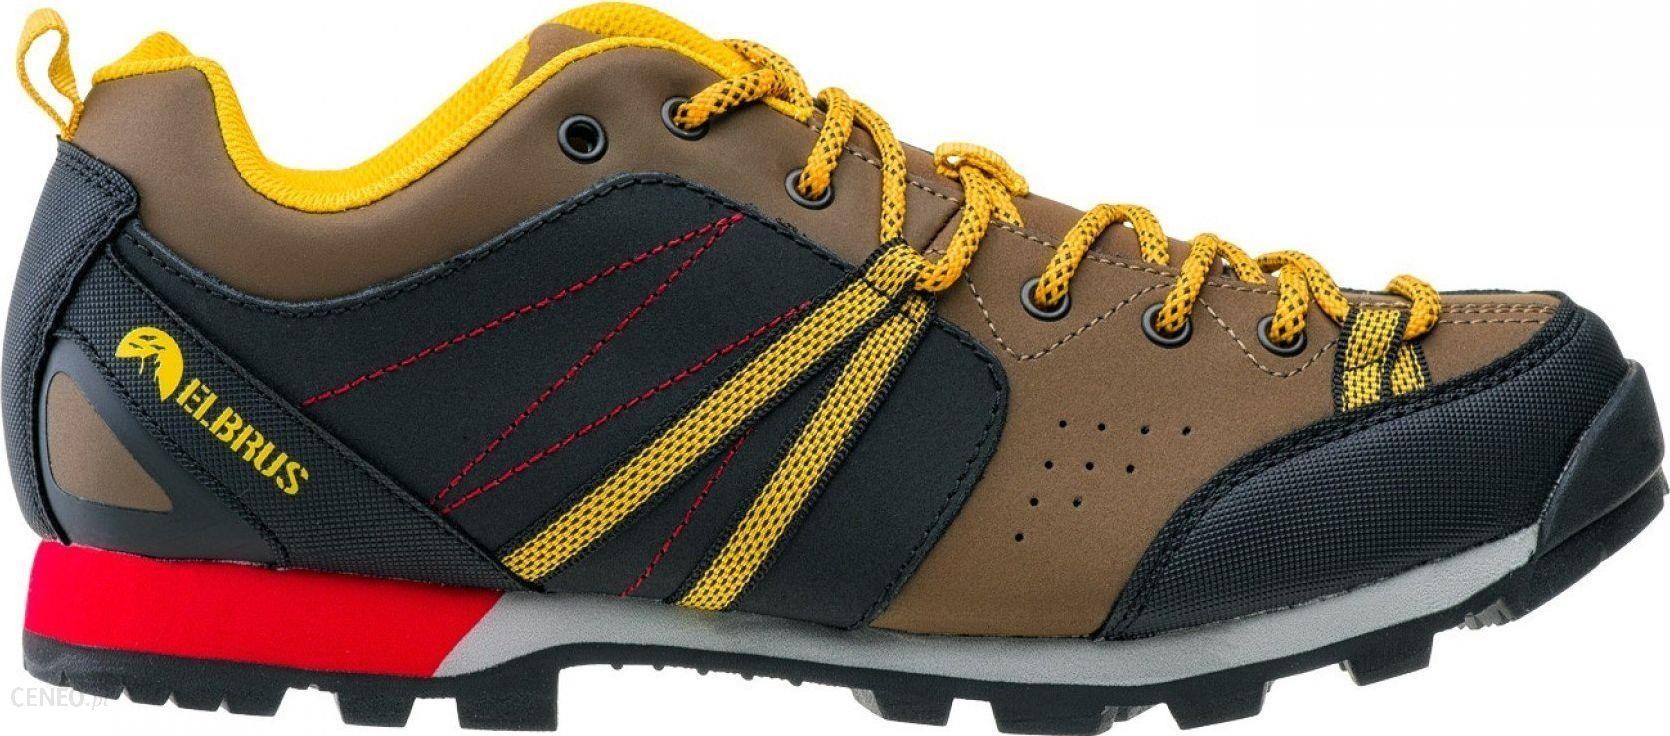 Męskie buty trekkingowe GERDIS 4719 BLKDK GREY ELBRUS